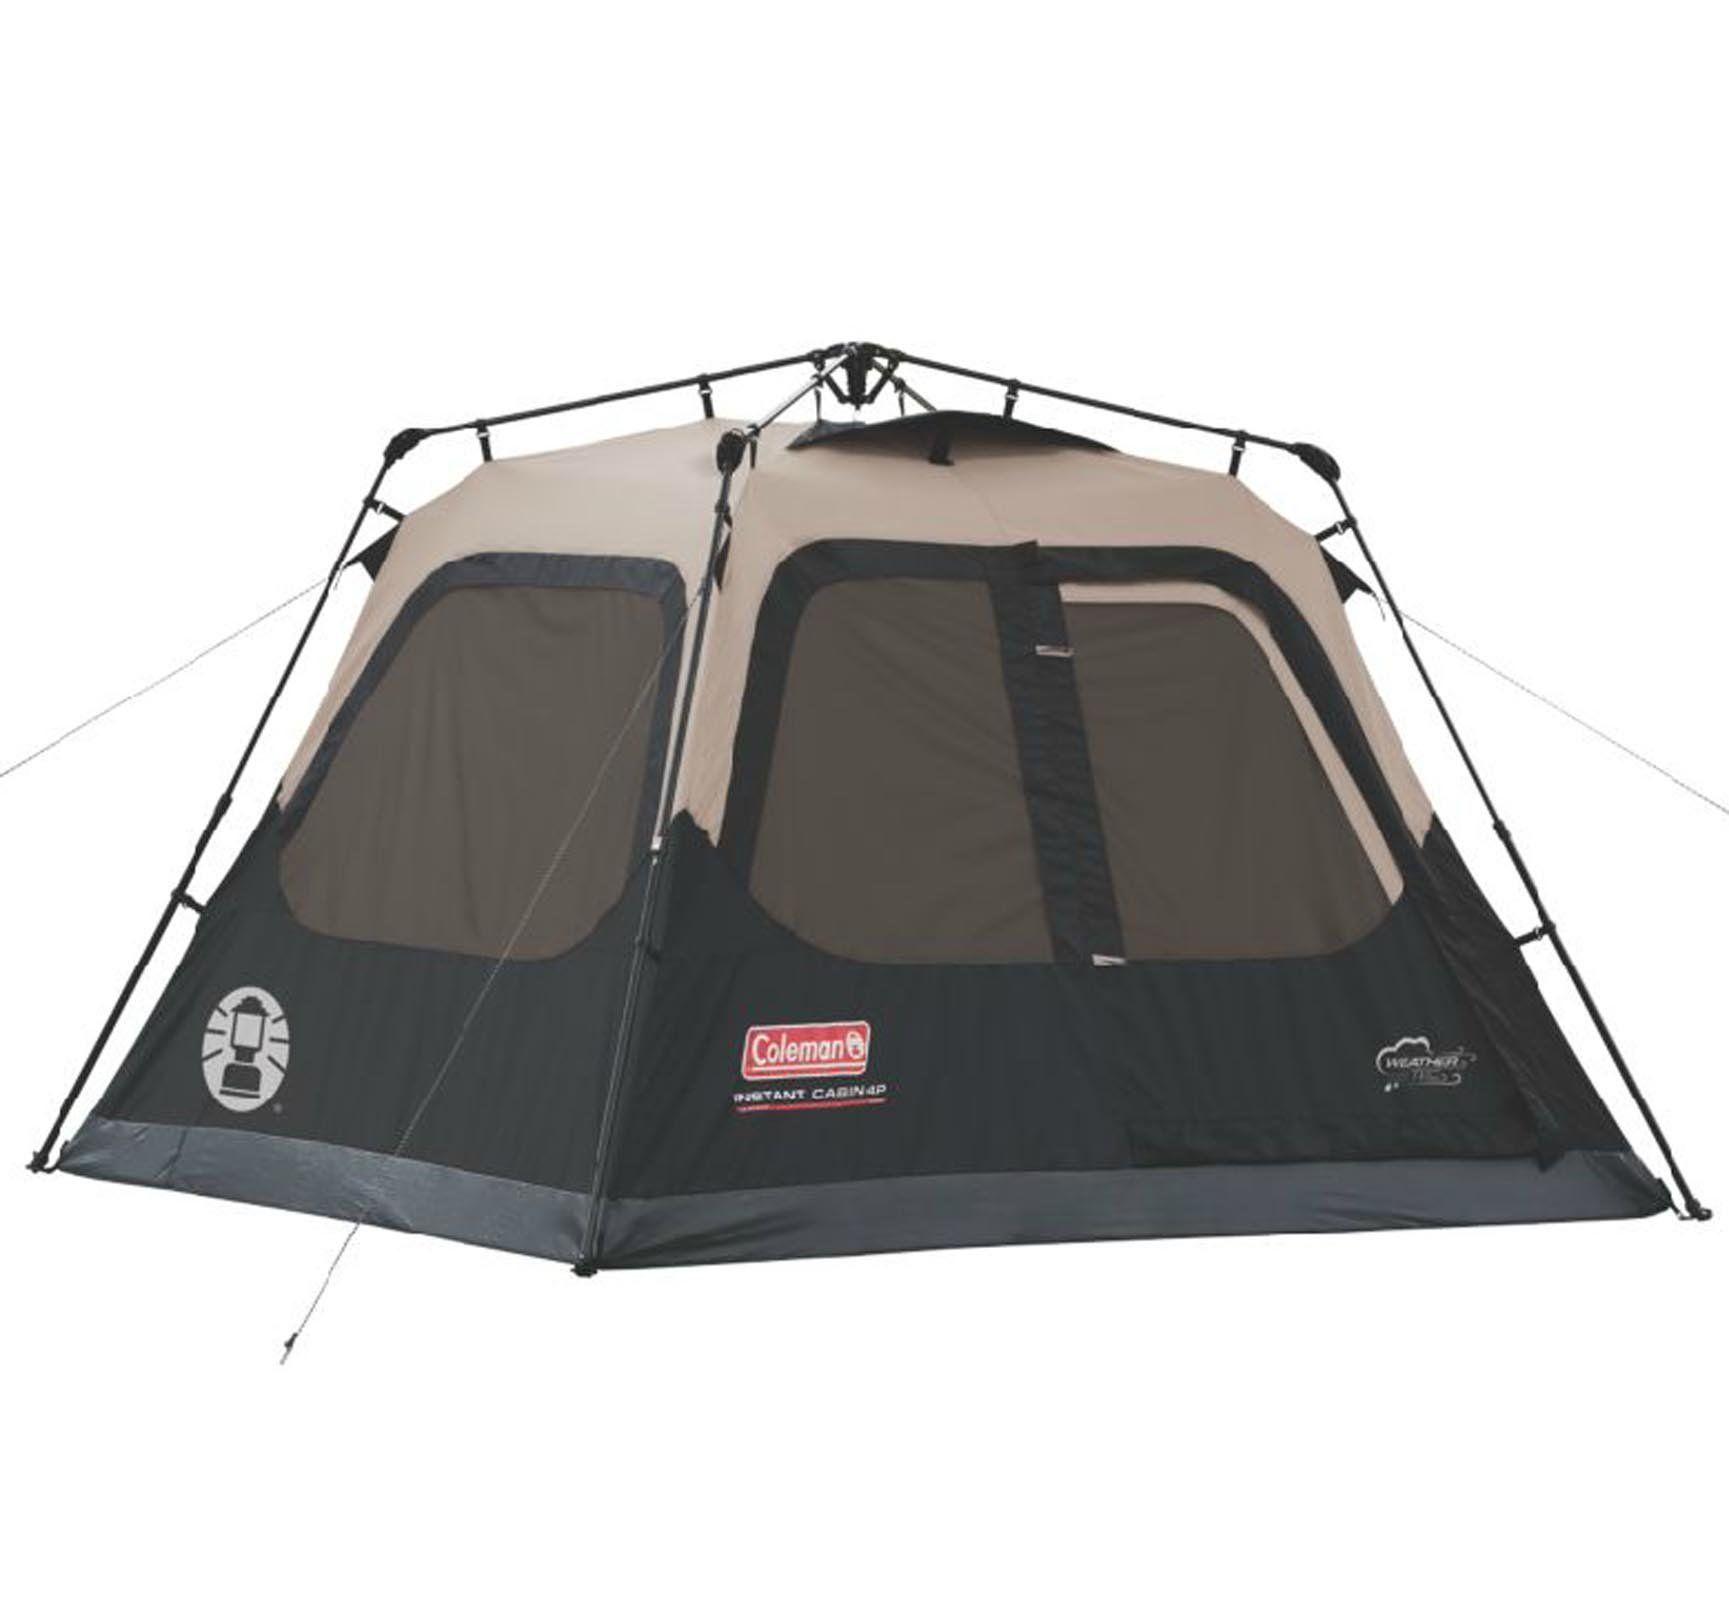 COLEMAN Outdoor C&ing Waterproof Taped 4 Person Instant Tent | 8u0027 x 7  sc 1 st  Pinterest & NEW! COLEMAN Outdoor Camping Waterproof Taped 4 Person Instant ...